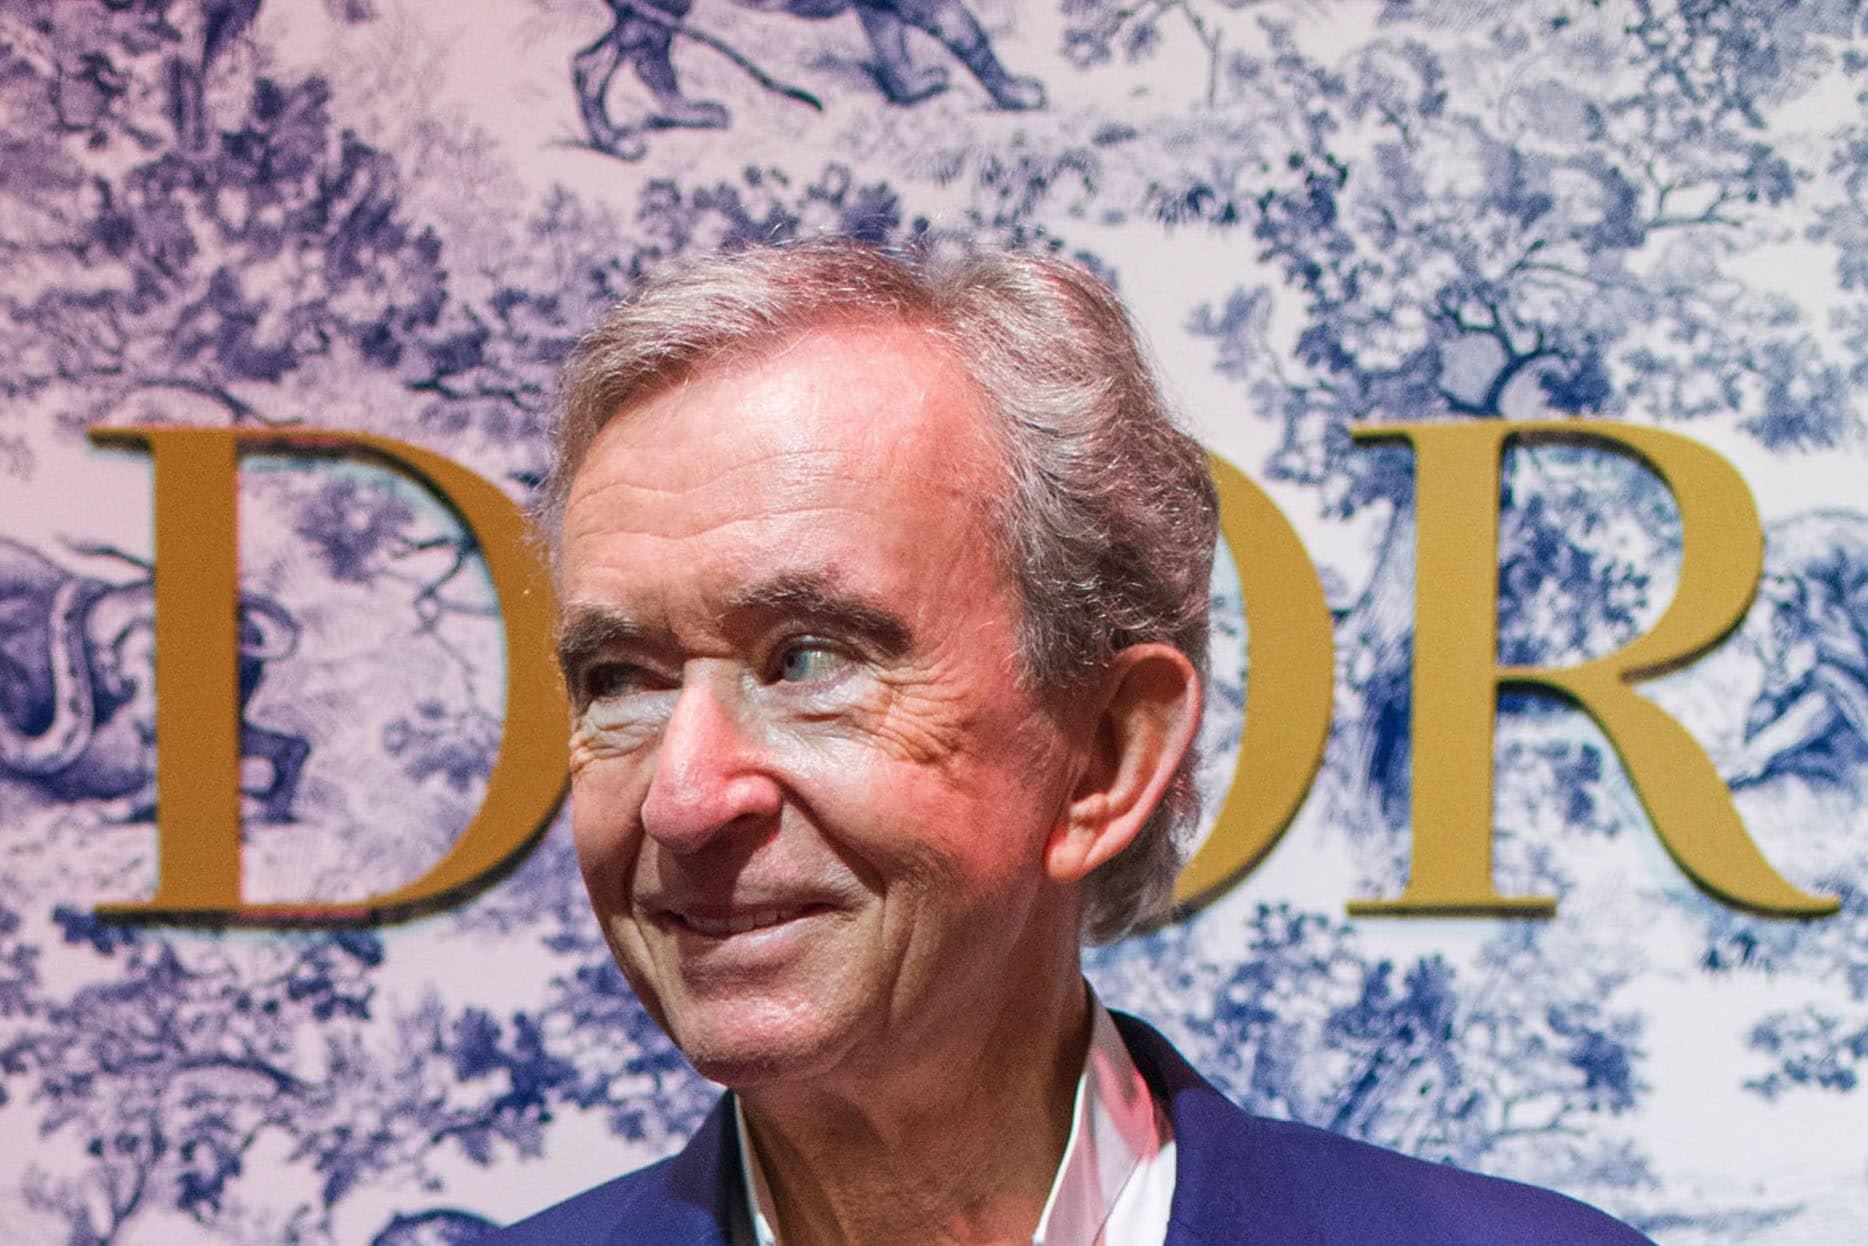 Billionaire LVMH Moet Hennessy Louis Vuitton SE Chairman Bernard Arnault at VivaTech 2021